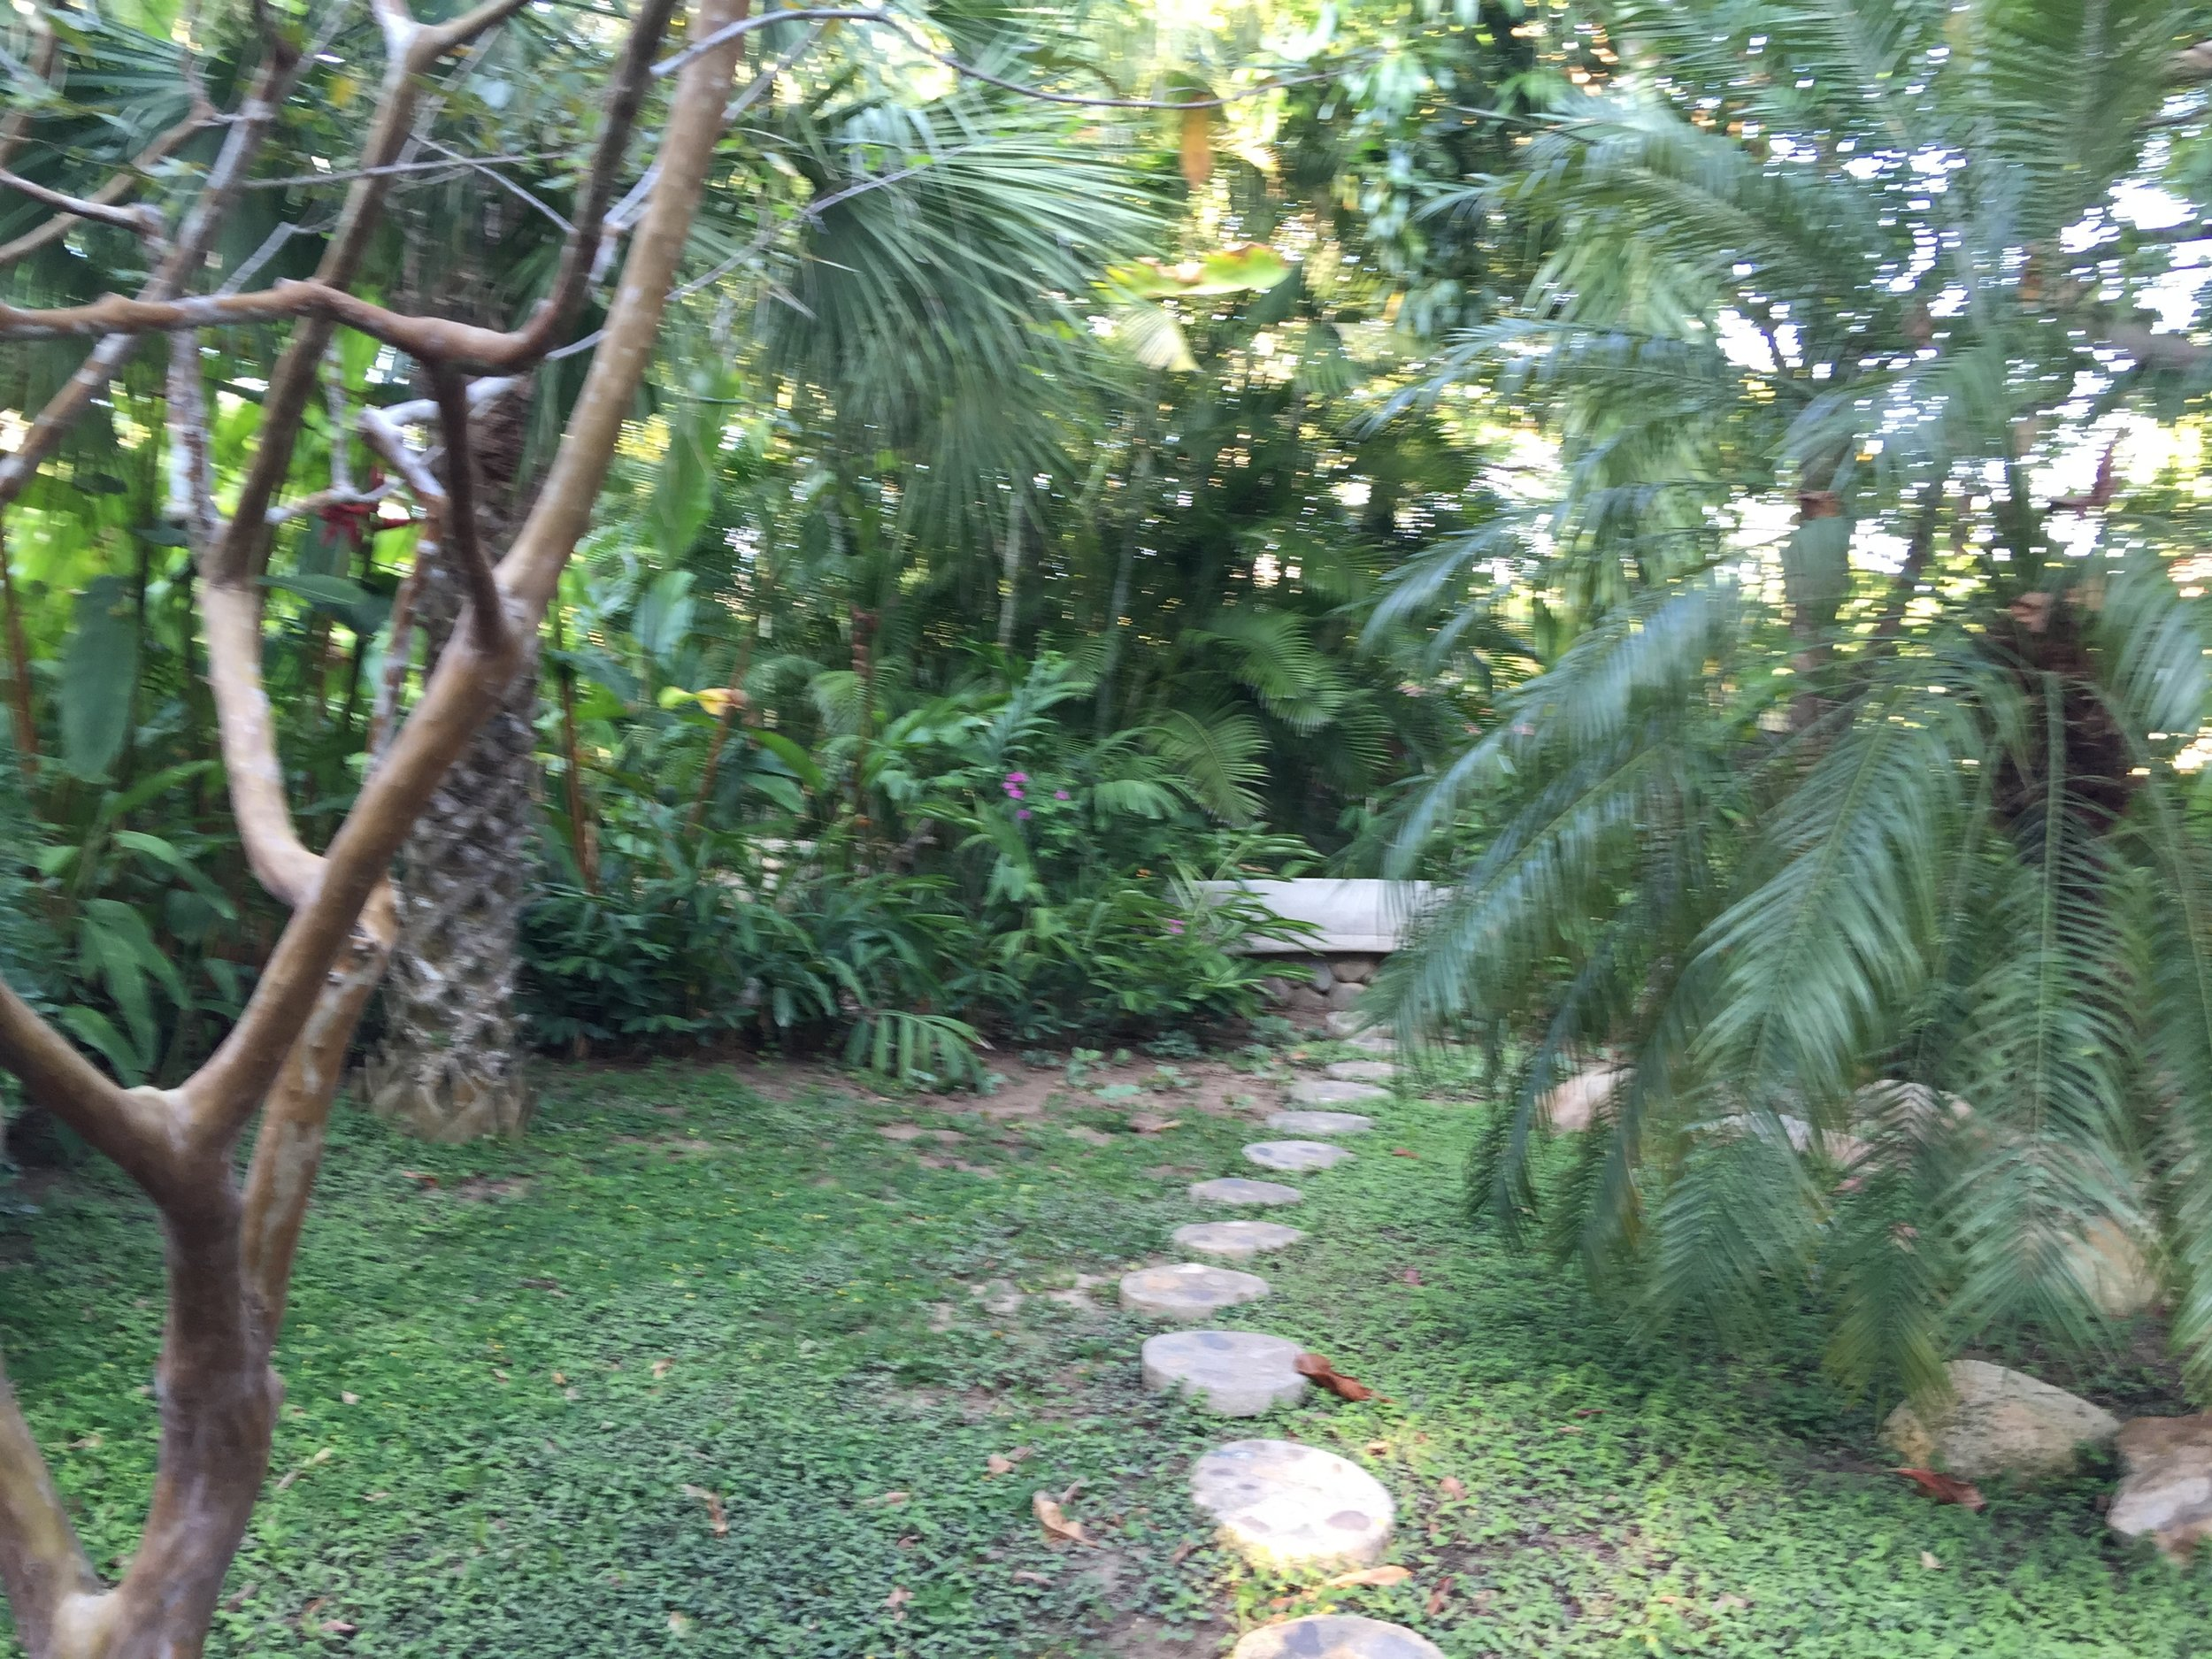 Pathway to meditation hideaway.